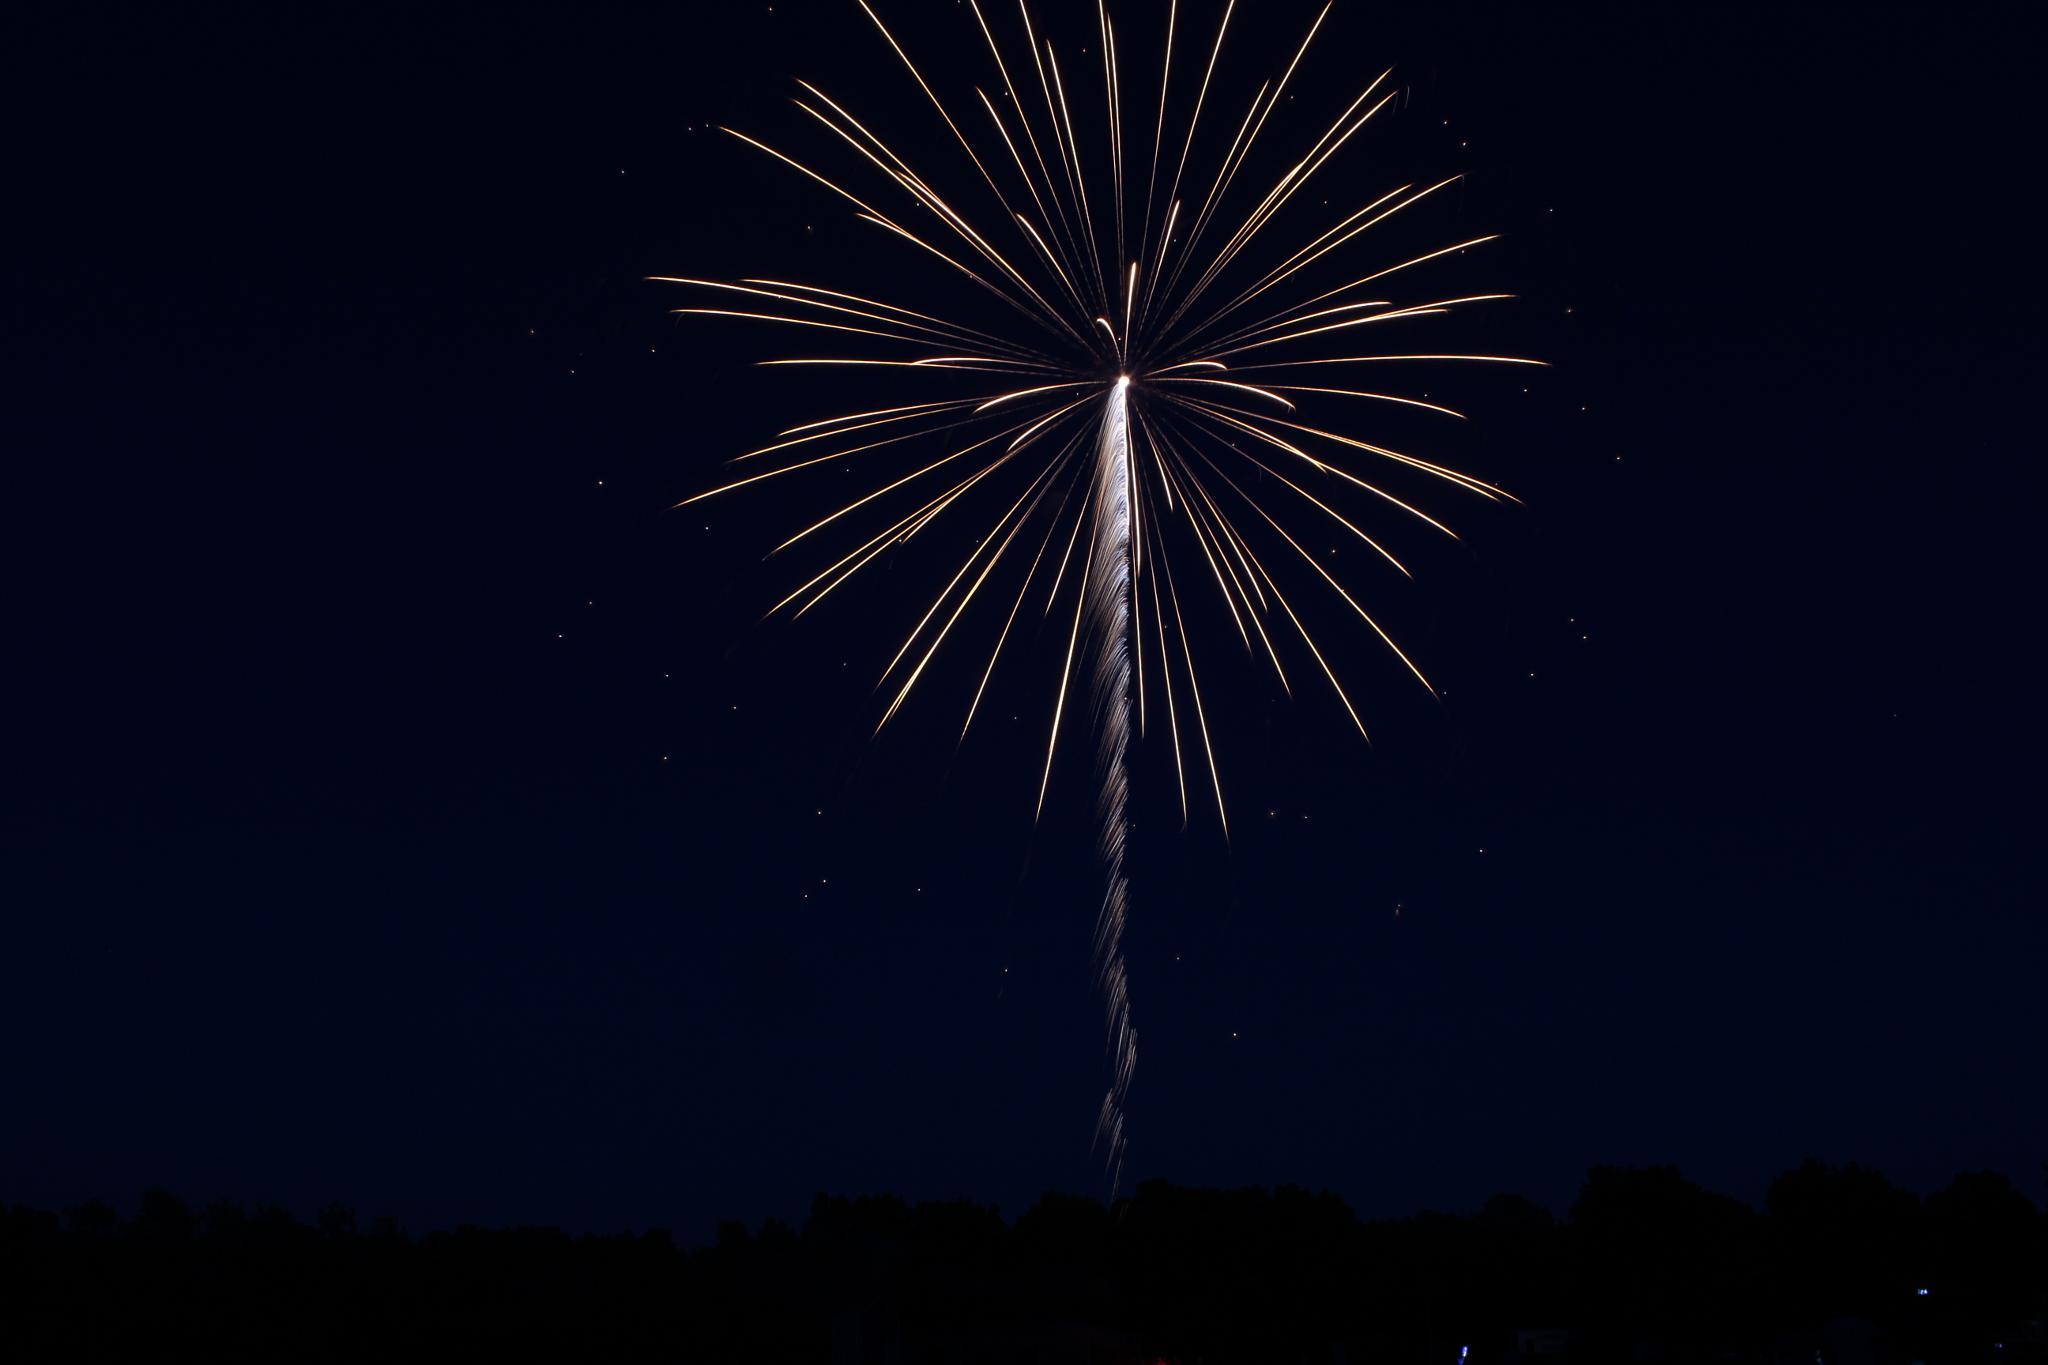 Fireworks by Thomas Merring